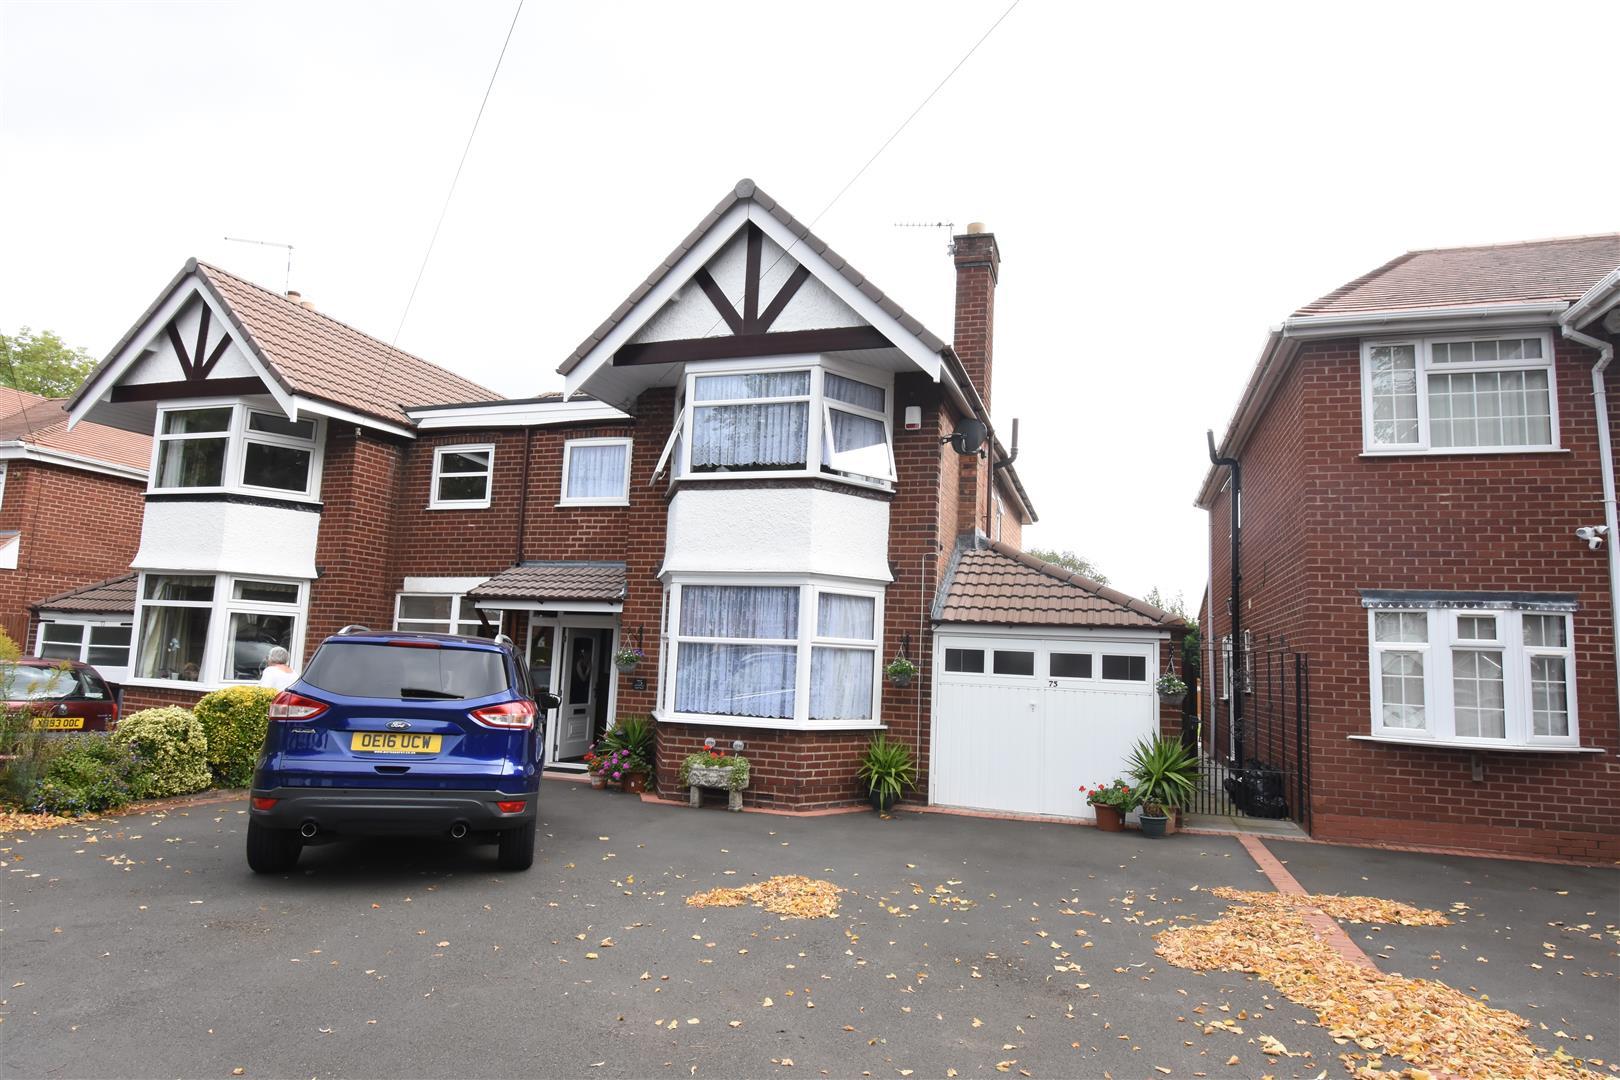 4 bed house for sale in Brockhurst Road, Hodge Hill, Birmingham, B36